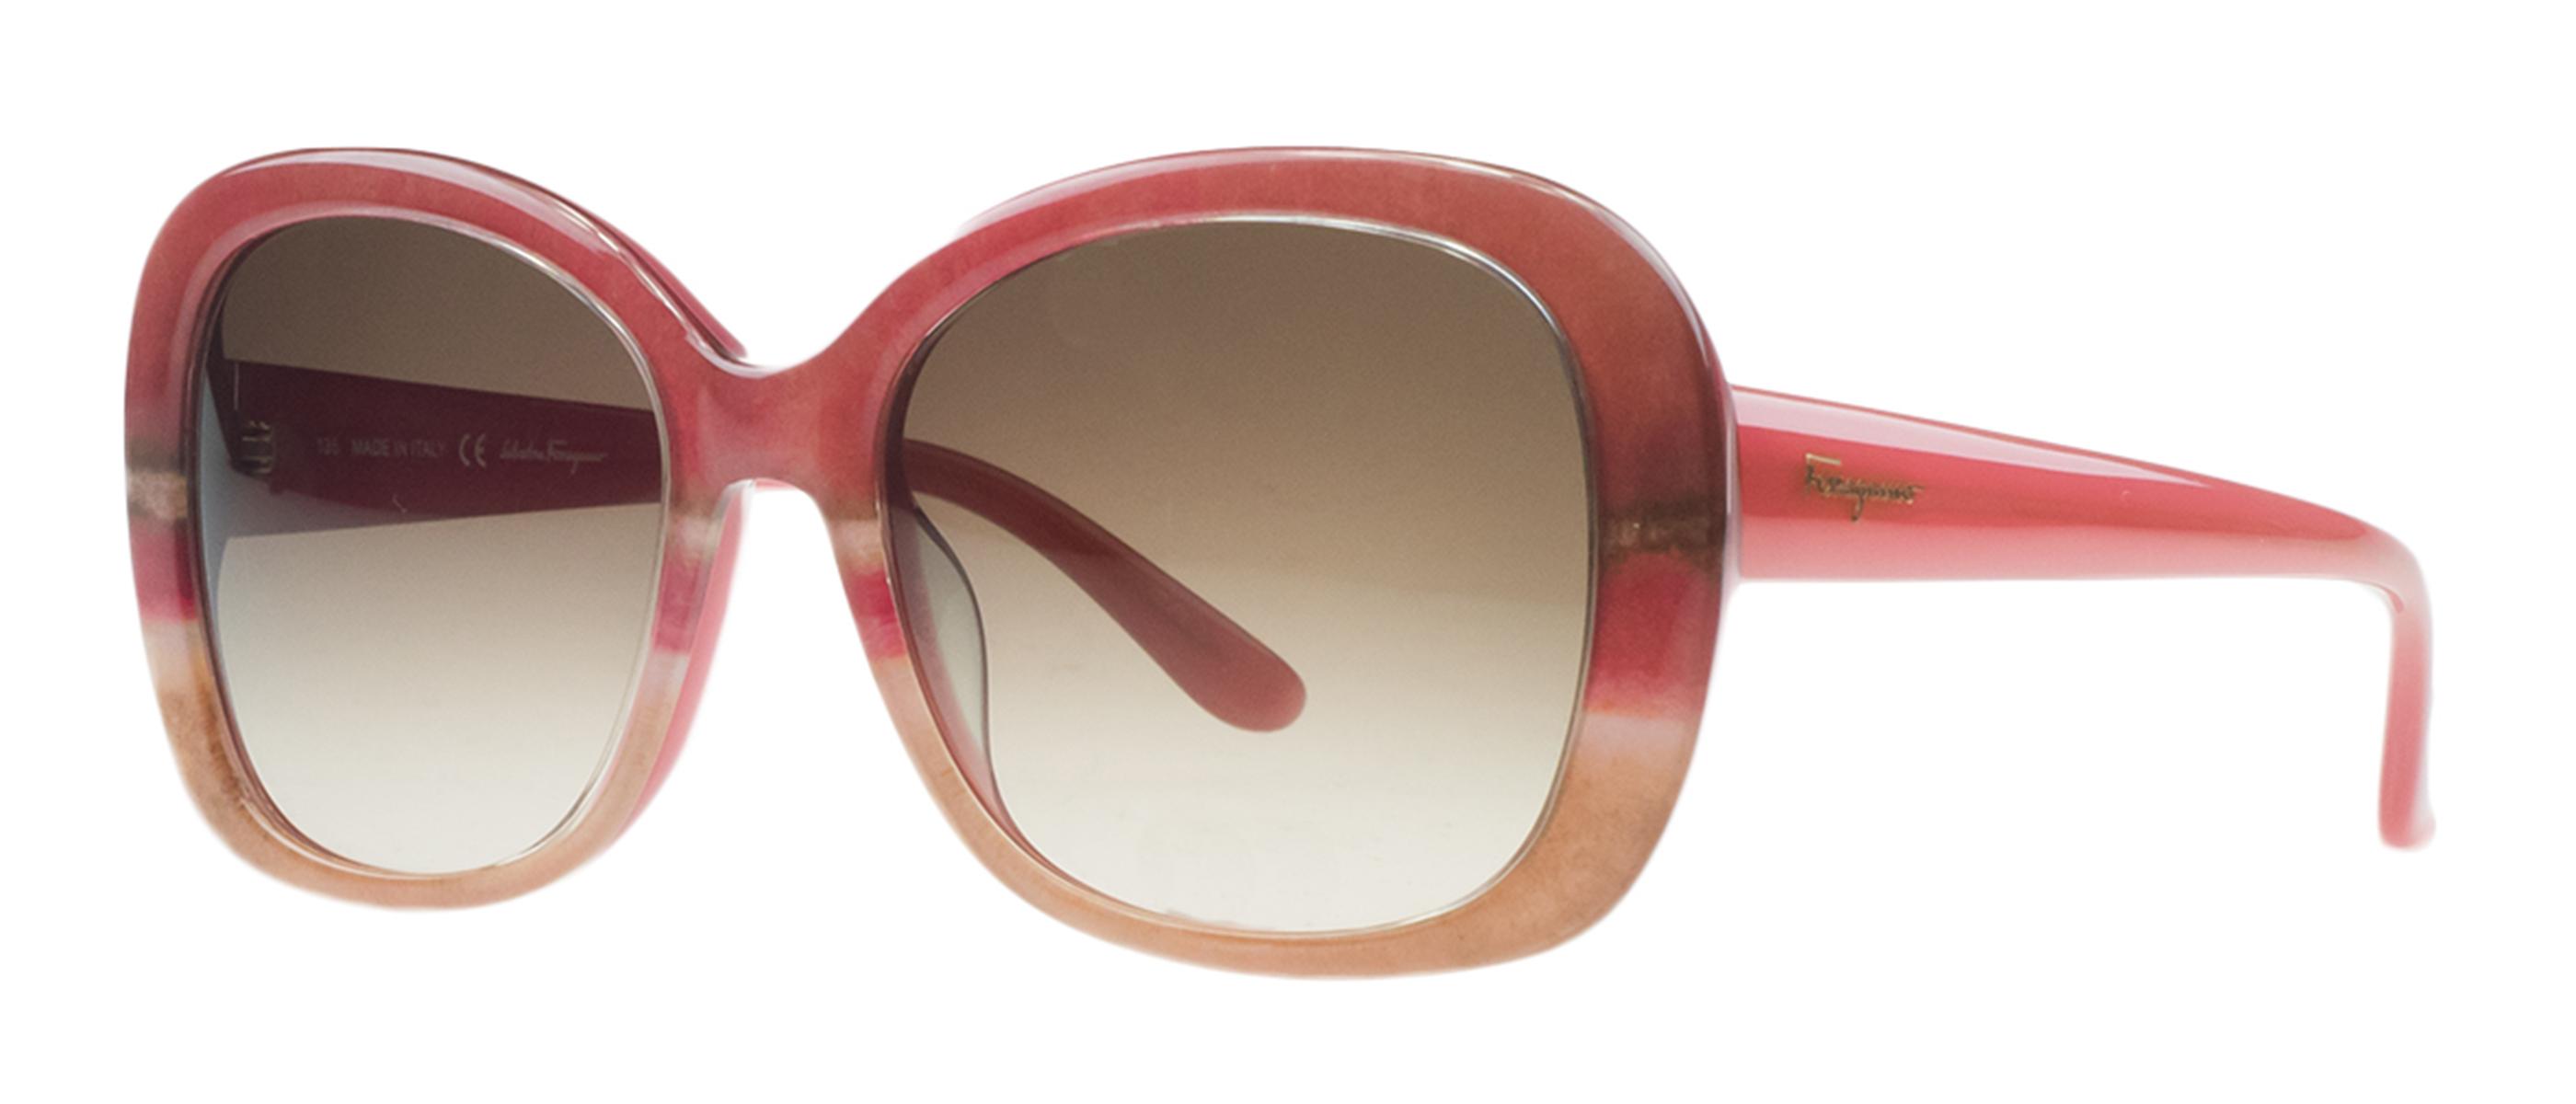 Salvatore Ferragamo SF678/S 529 Rose/Beige Square Sunglasses